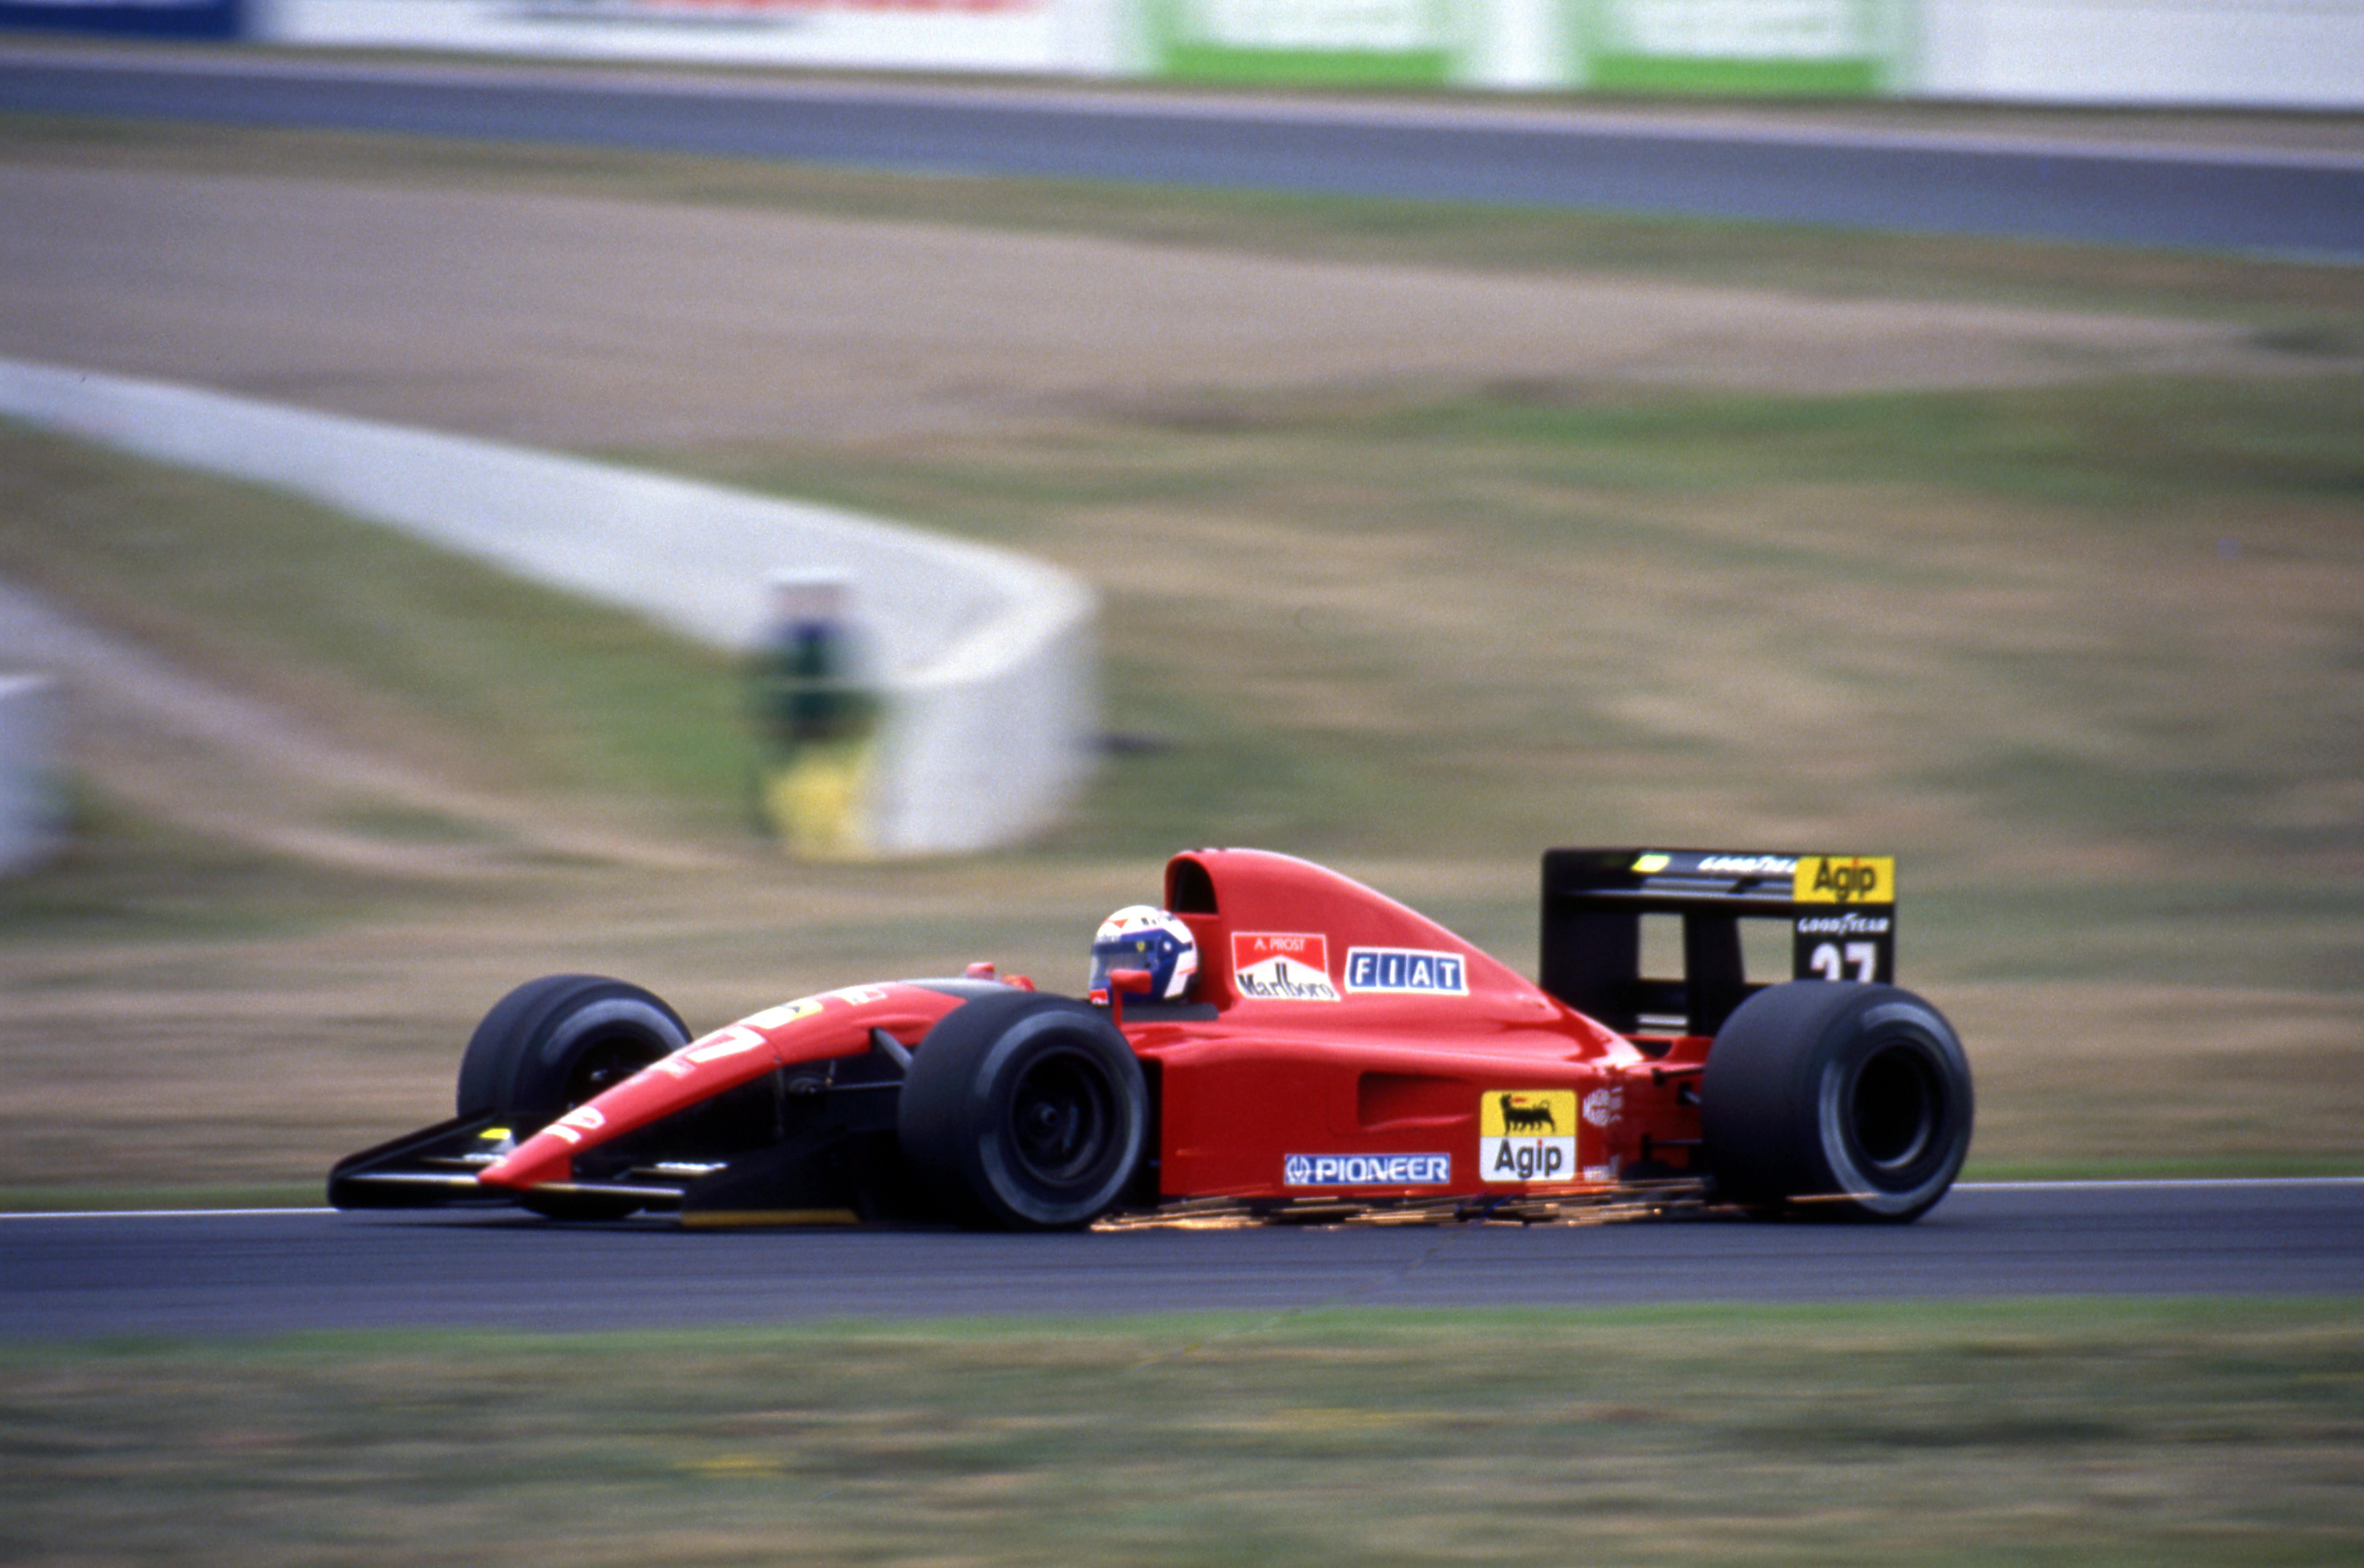 Alain Prost Ferrari French Grand Prix 1991 Magny-Cours